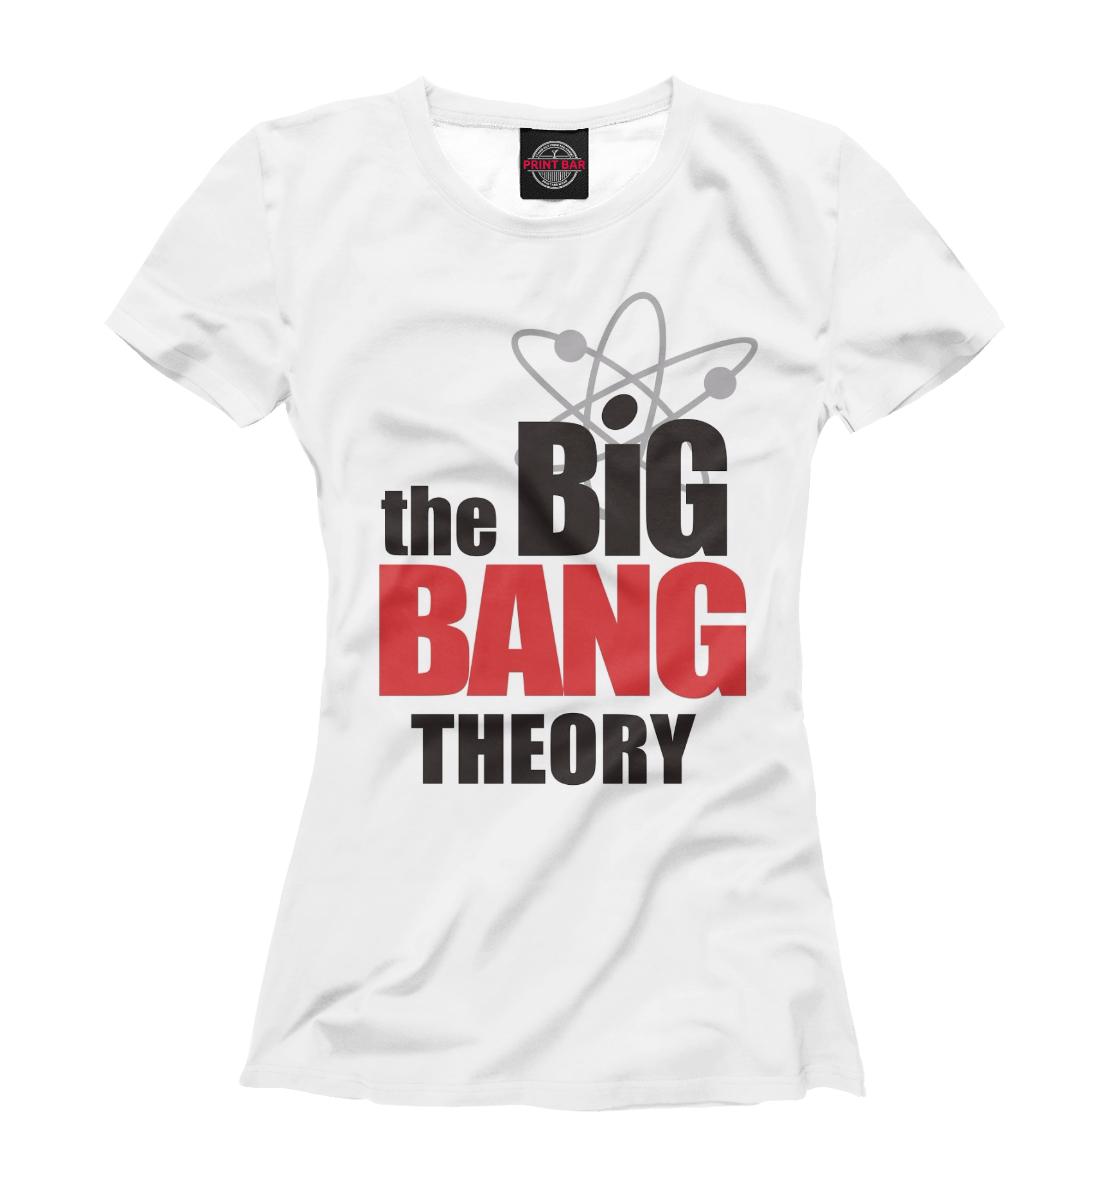 Купить The Big Bang Theory, Printbar, Футболки, TEO-602107-fut-1